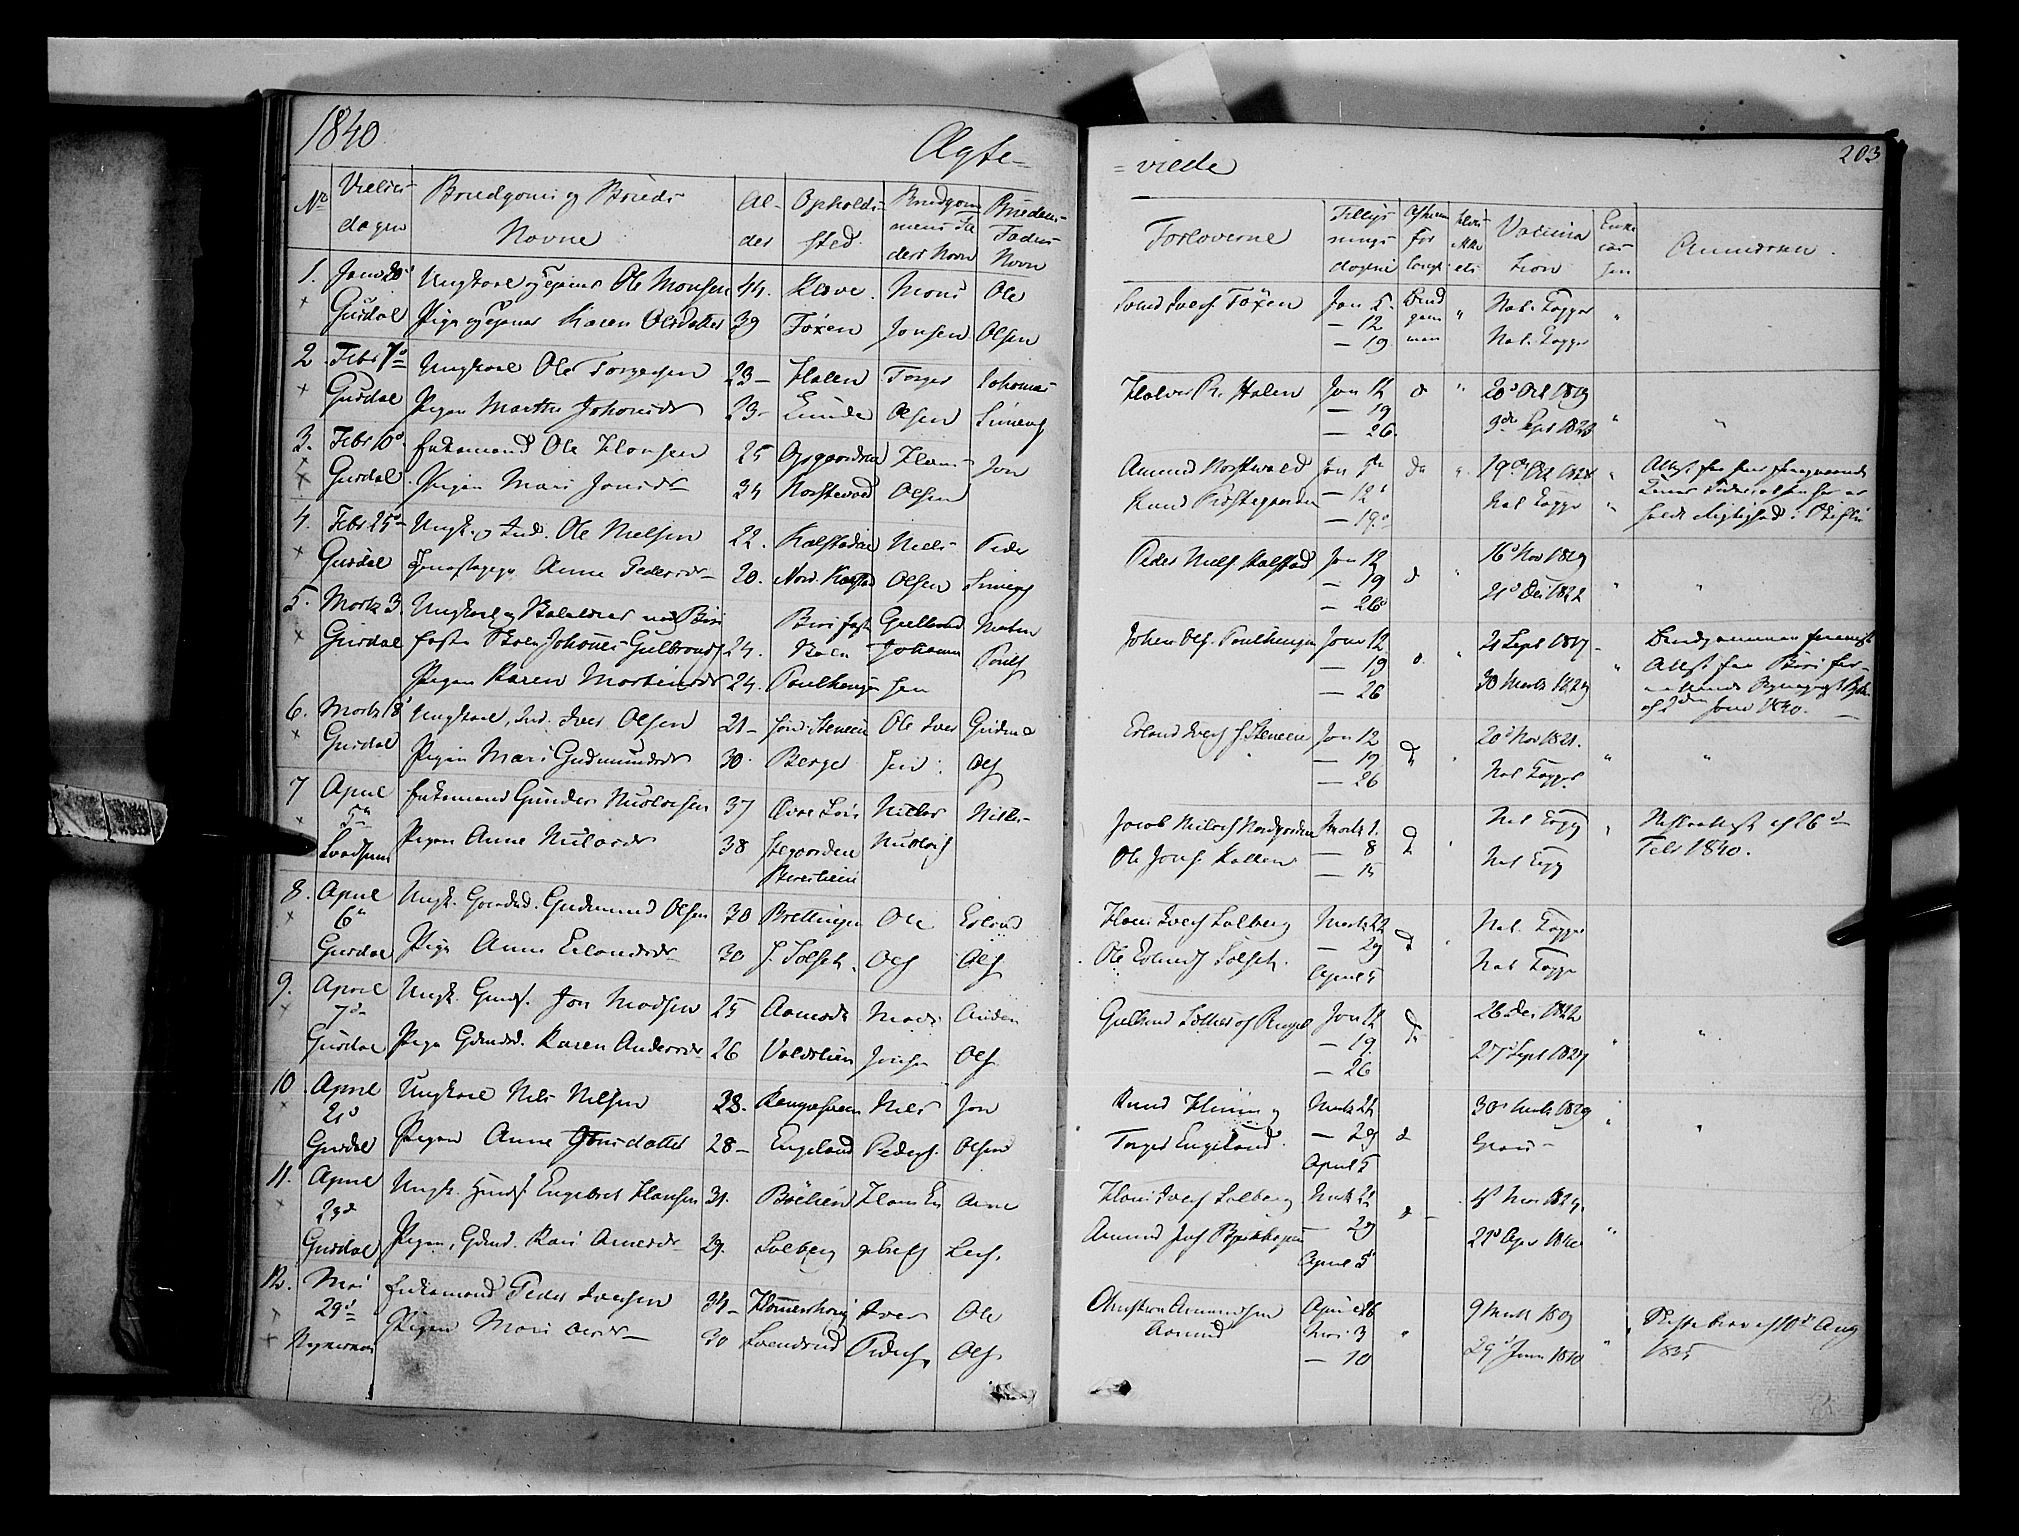 SAH, Gausdal prestekontor, Ministerialbok nr. 7, 1840-1850, s. 203